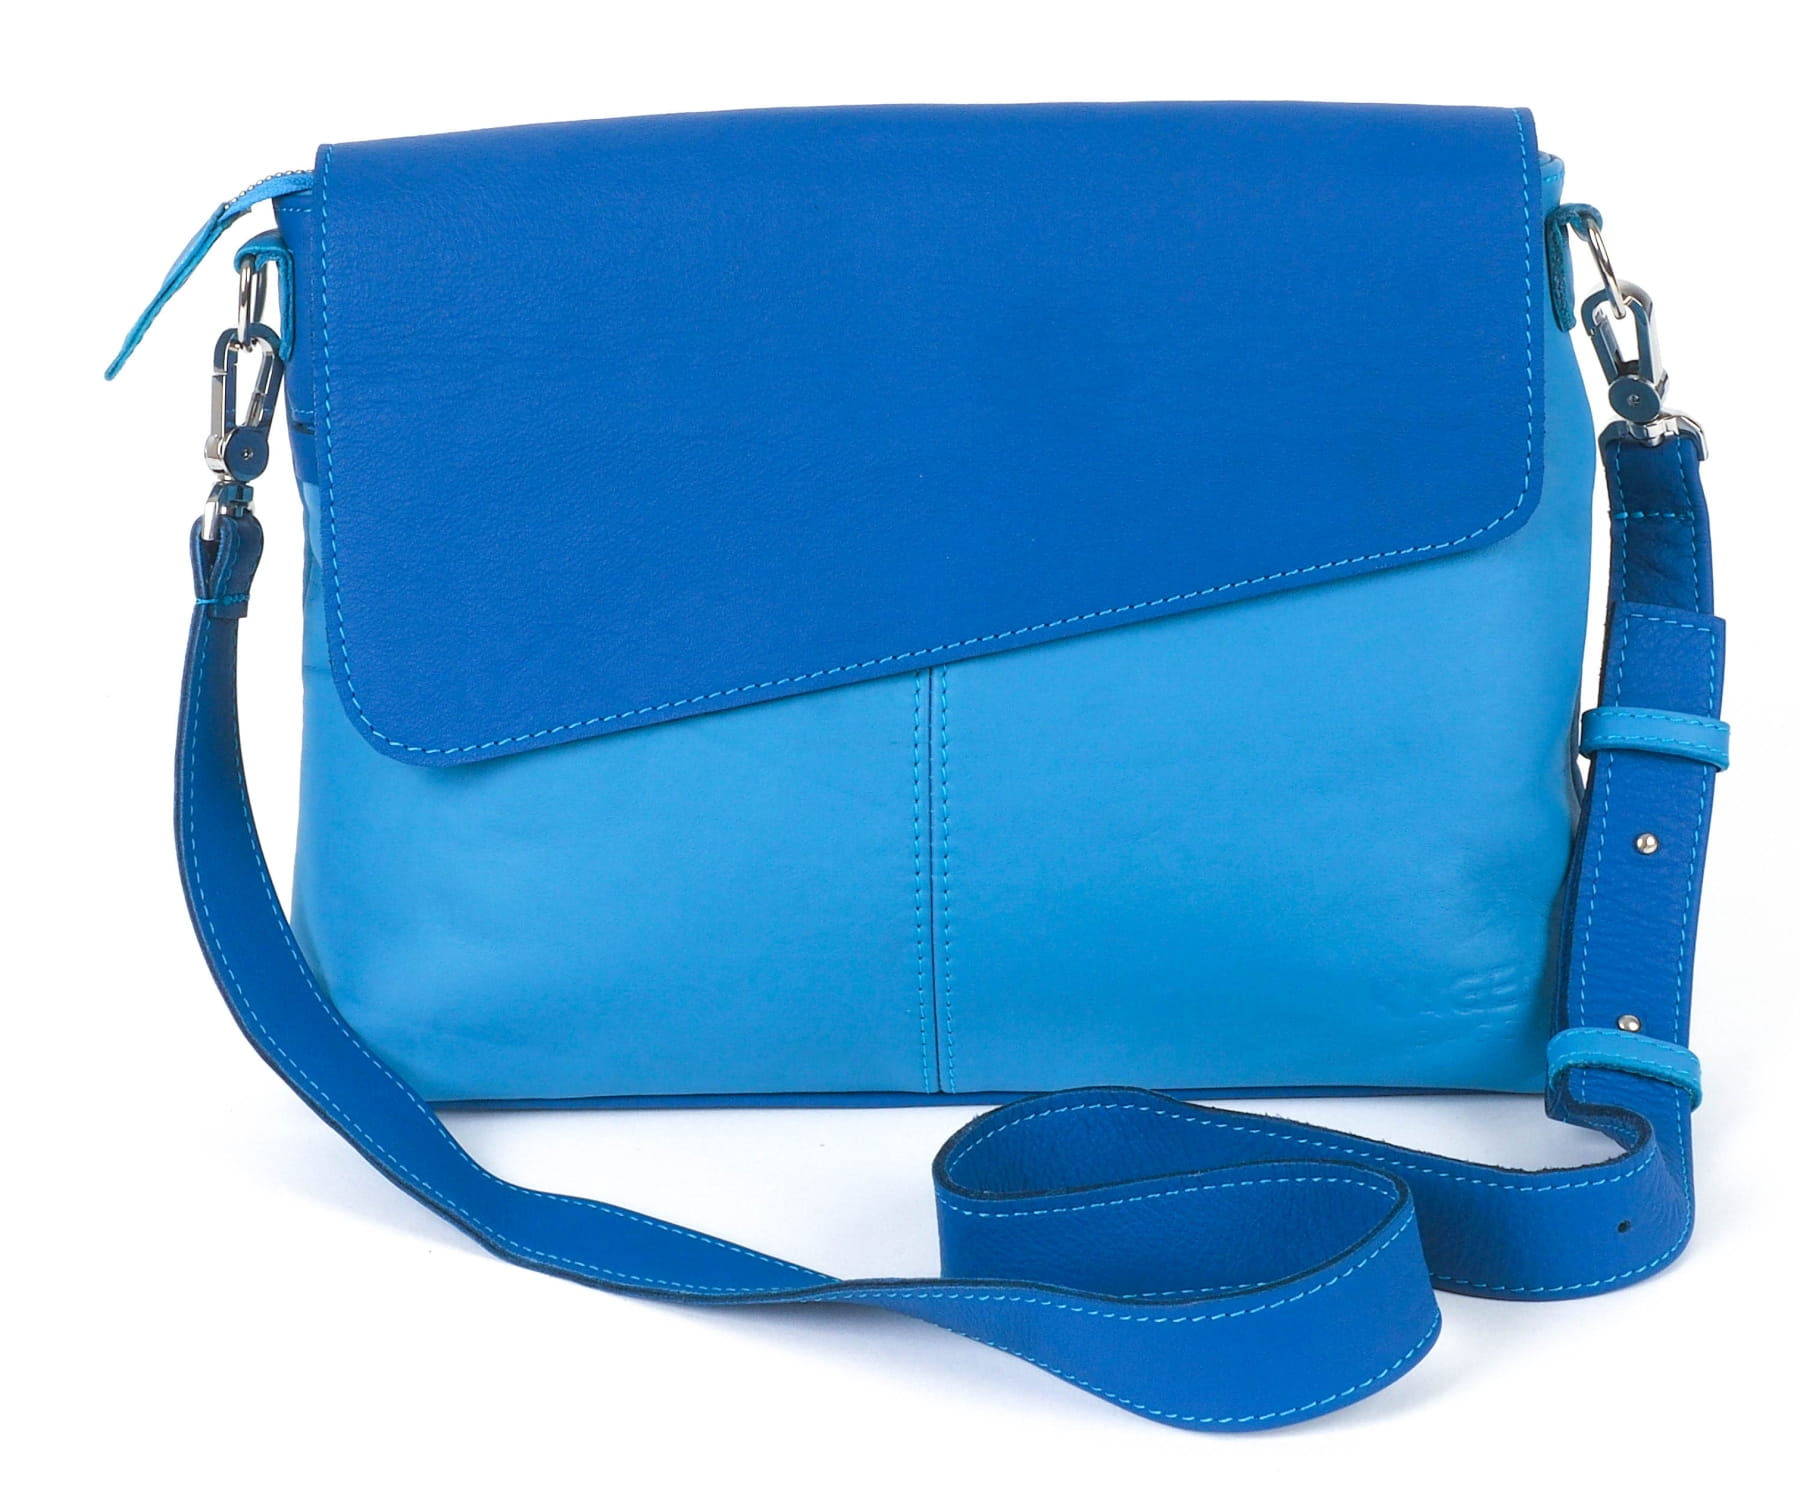 903cb66c67cbe ... torebka-skorzana-damska-listonoszka-niebieska-molly-kagenbags (2) ...